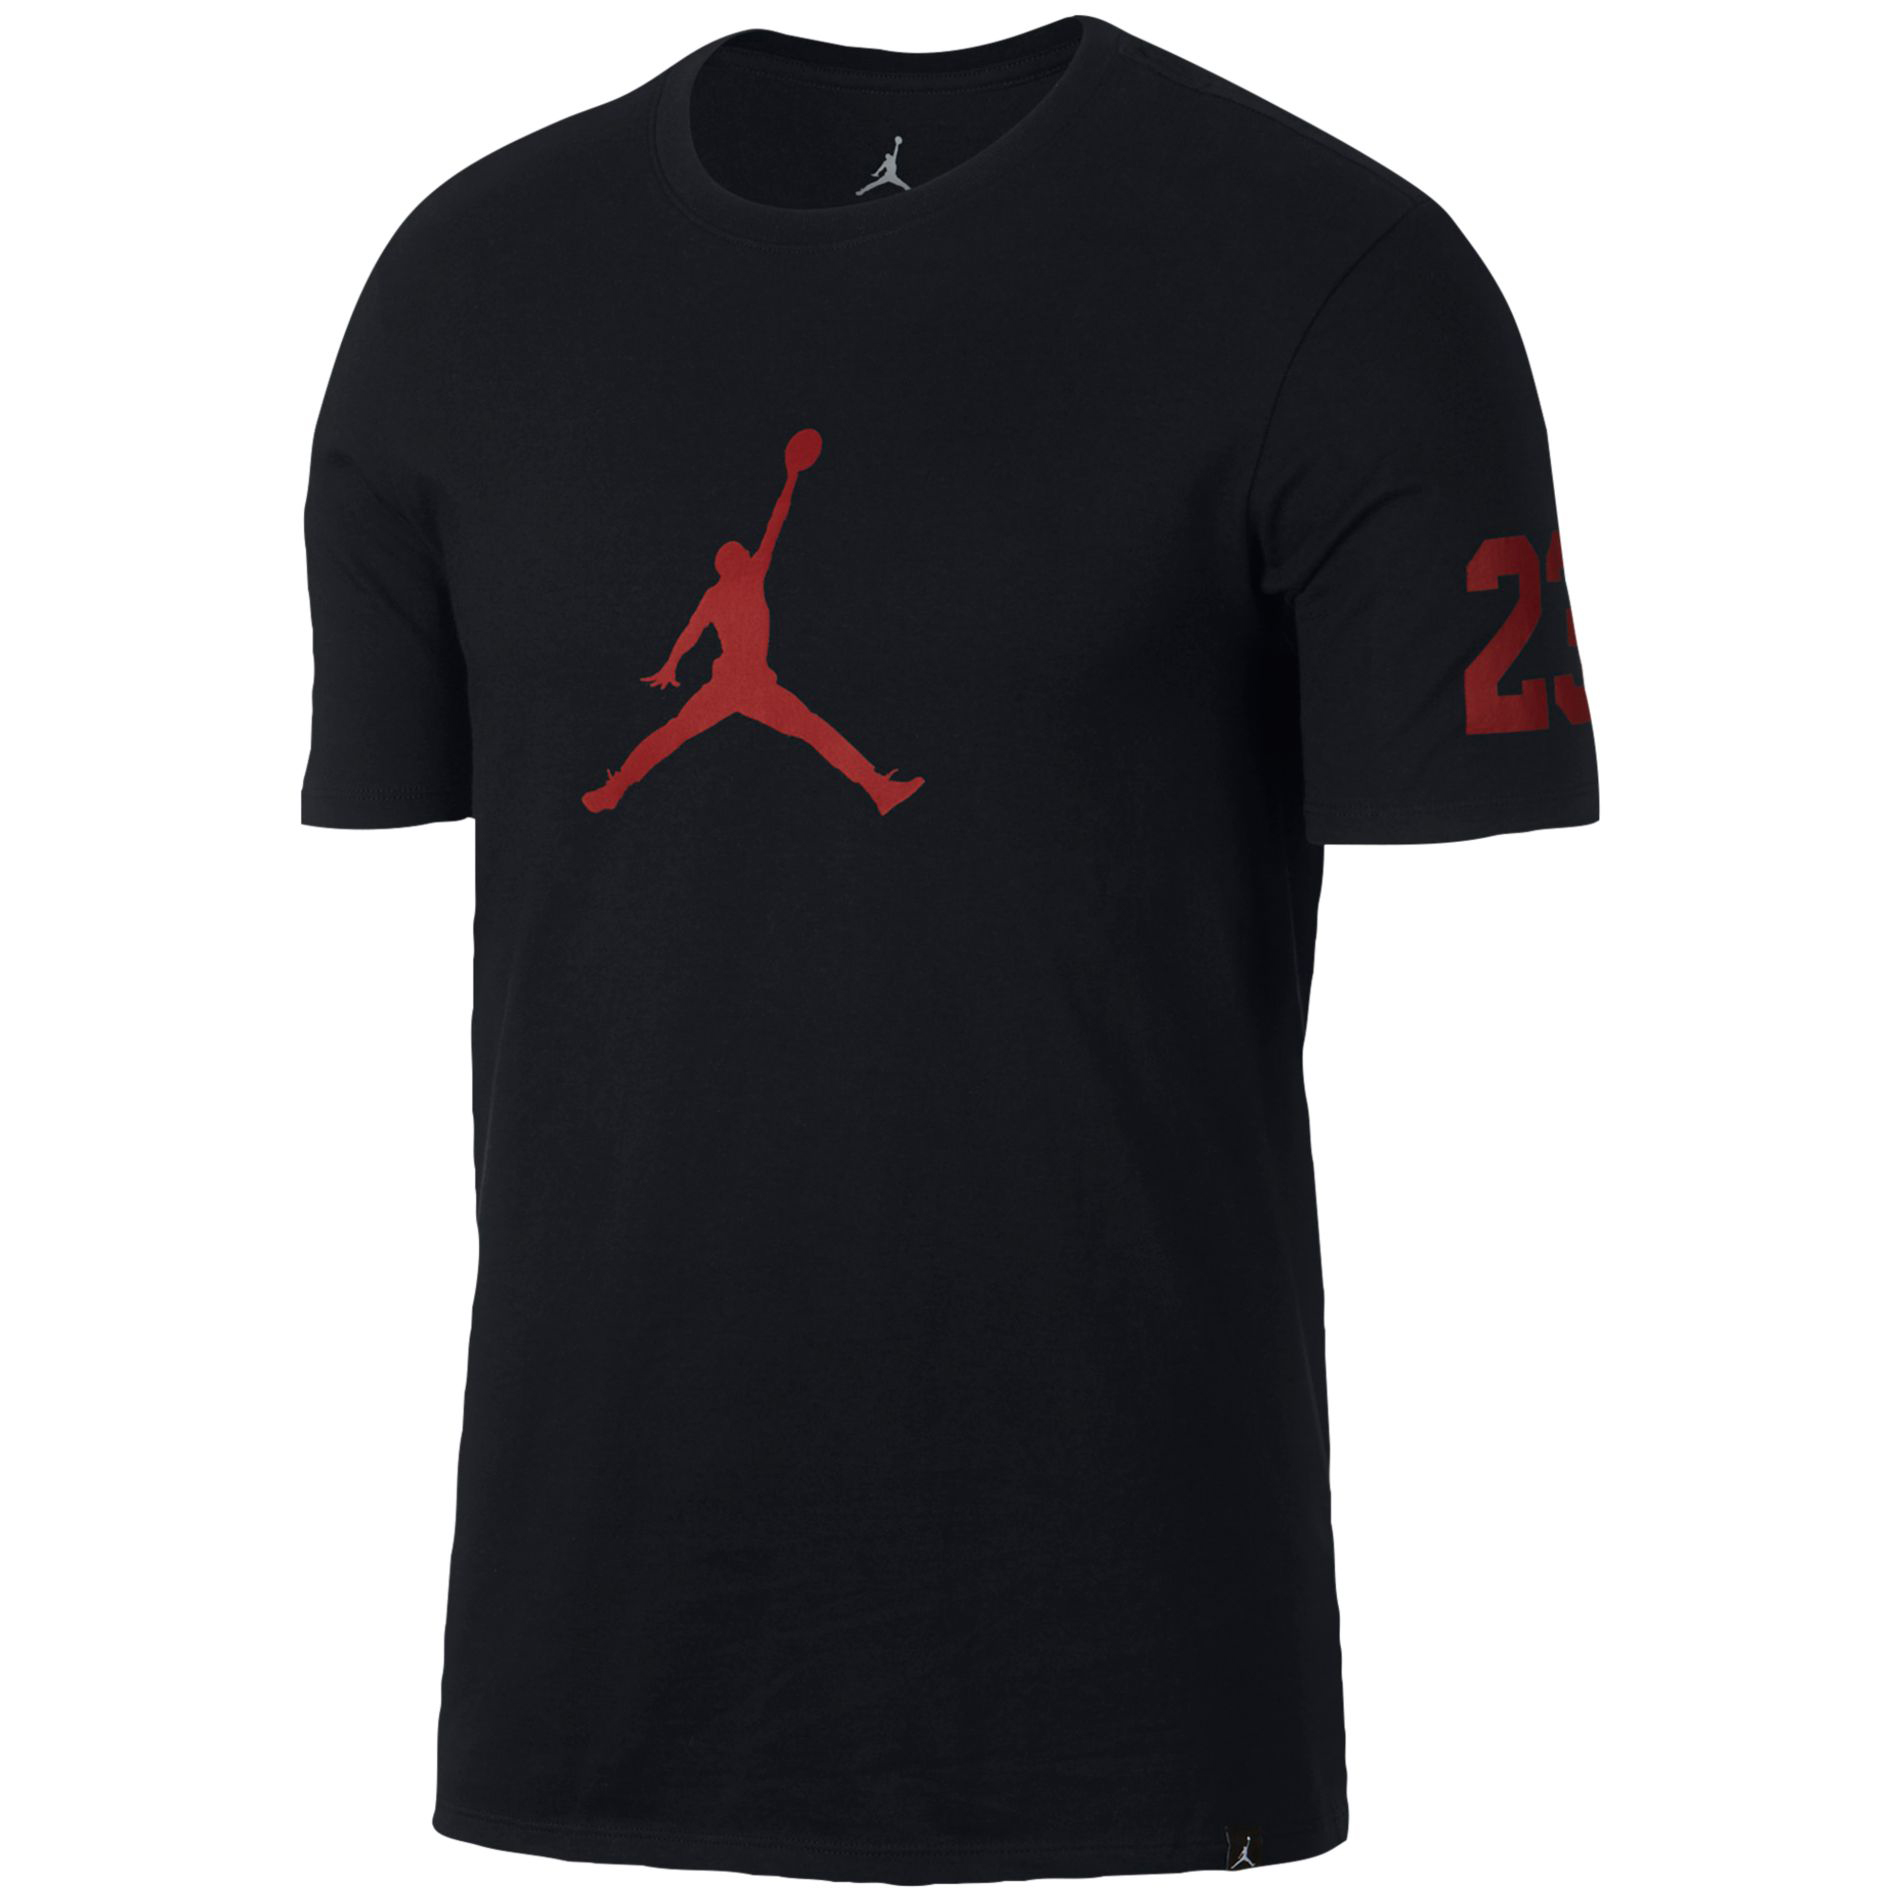 jordan-1-bred-toe-sneaker-tee-1